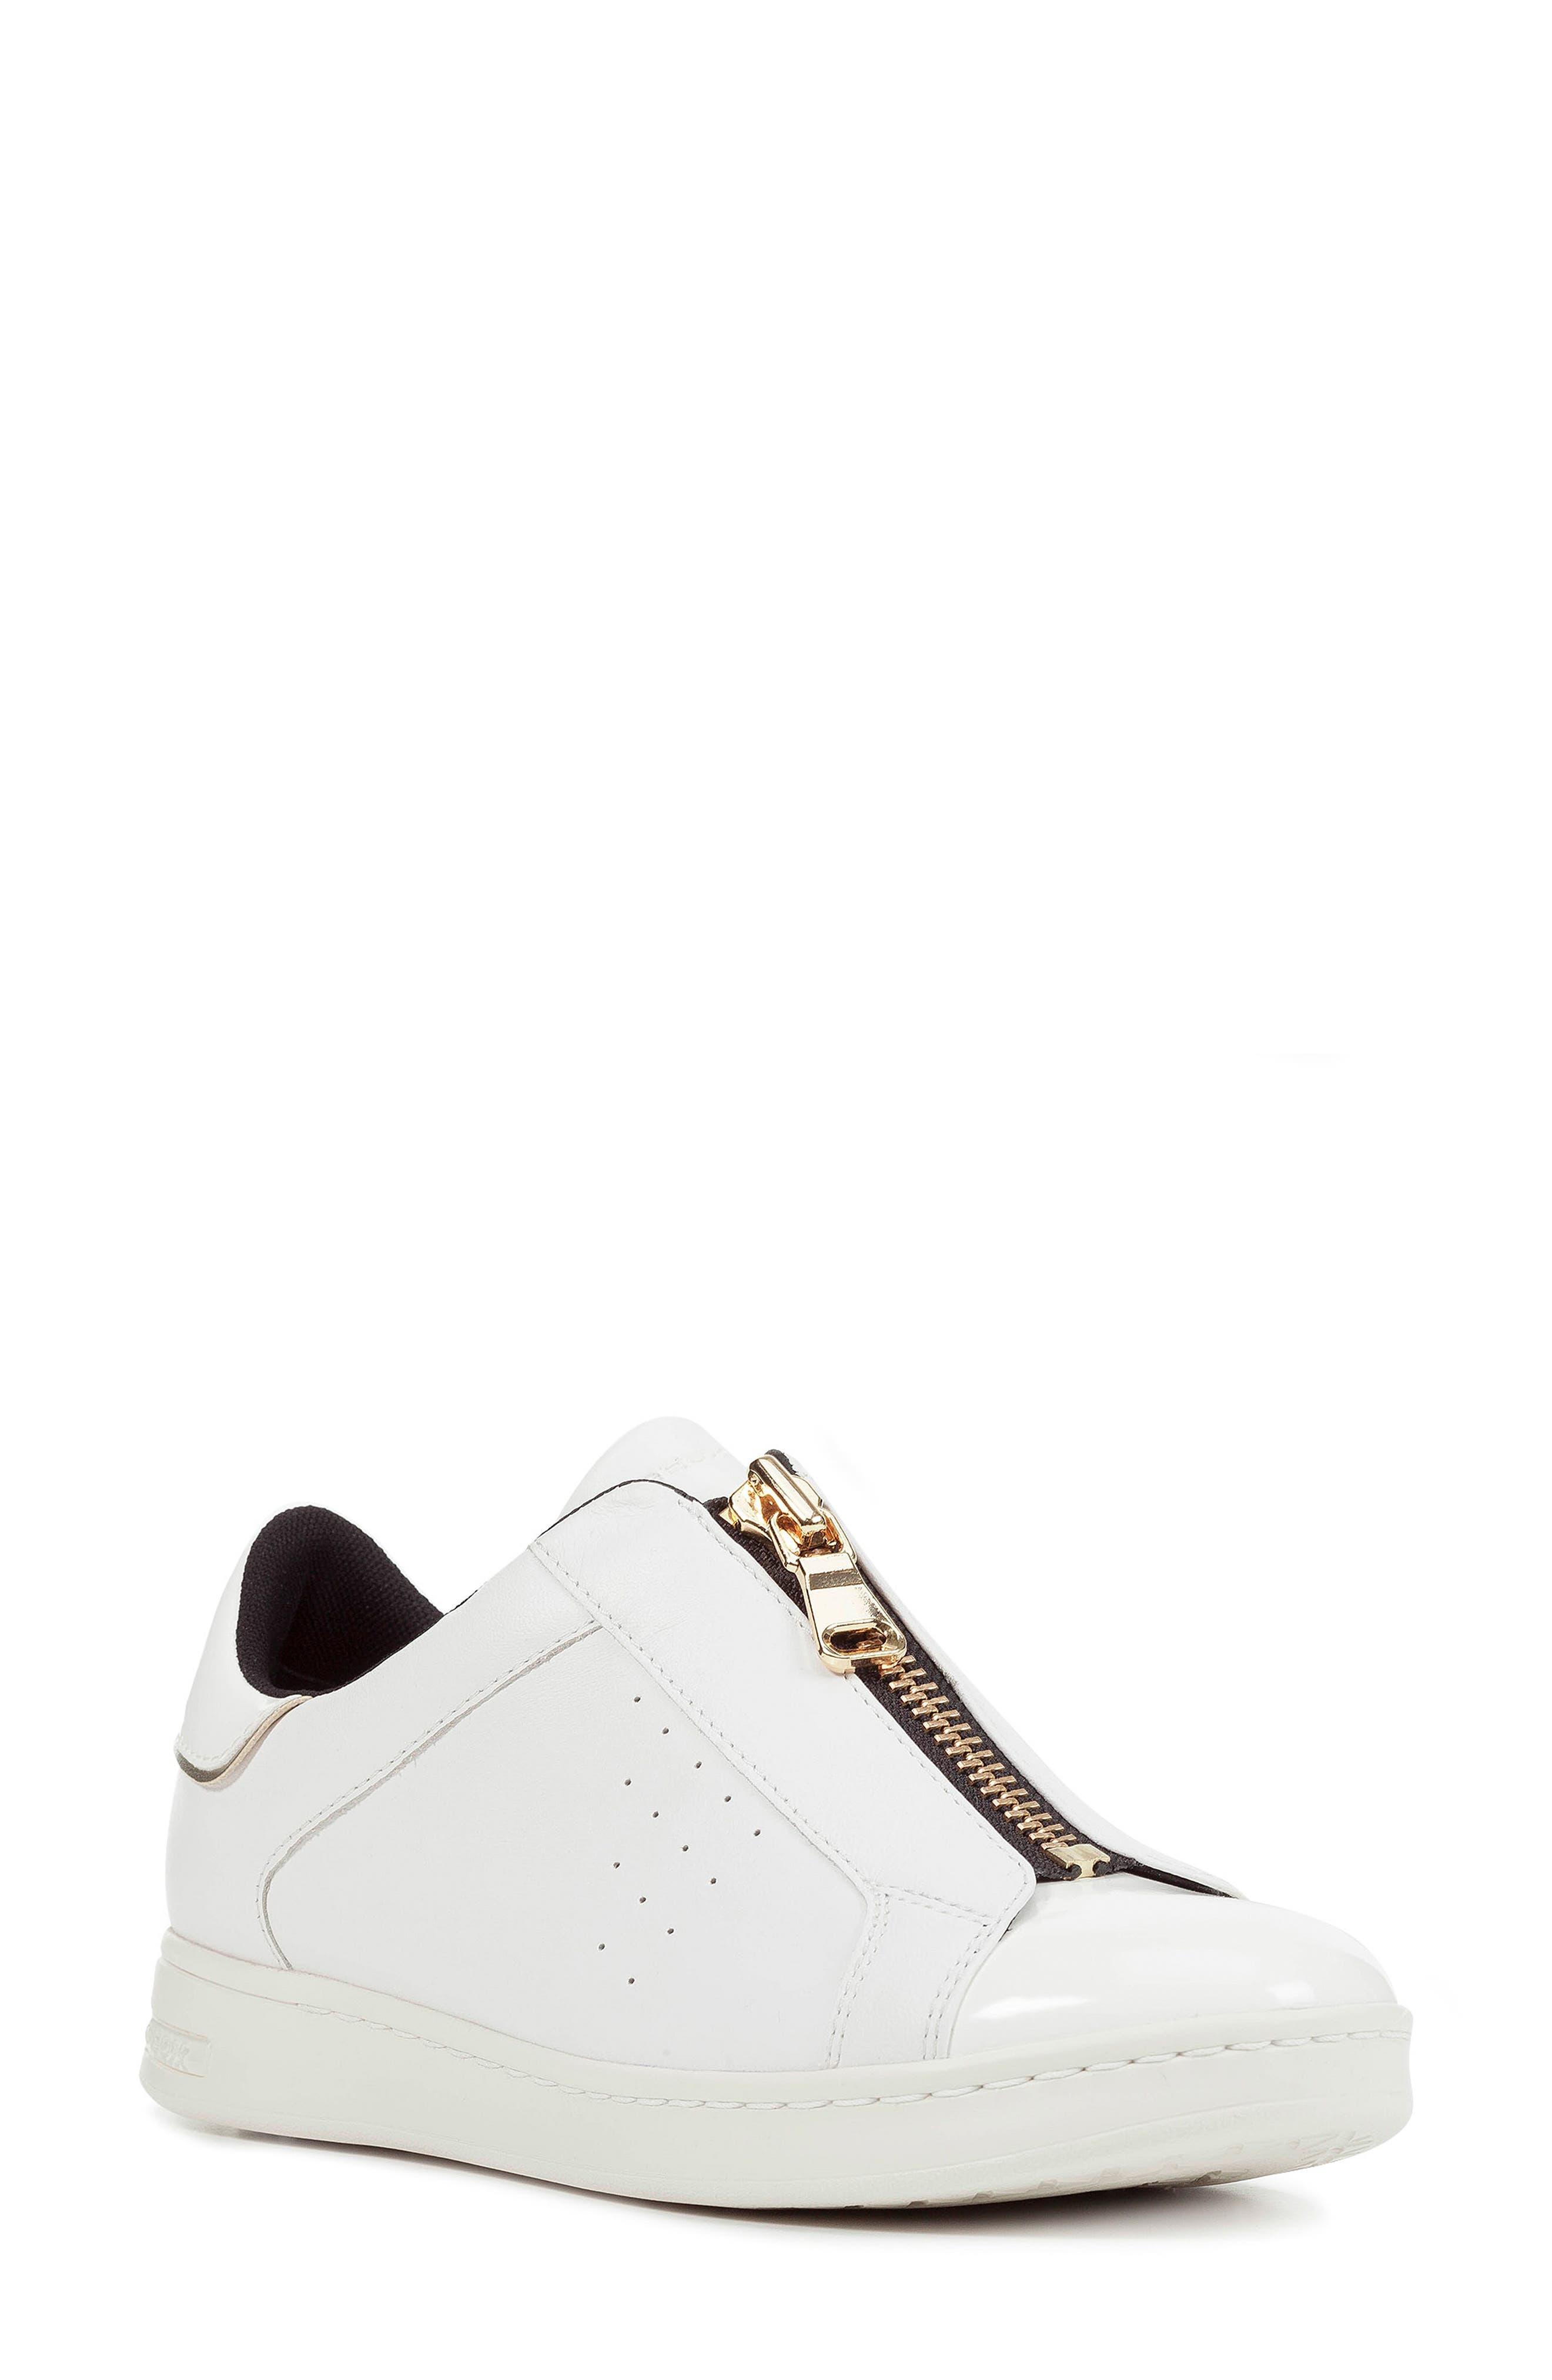 Jaysen Sneaker,                             Main thumbnail 1, color,                             WHITE LEATHER